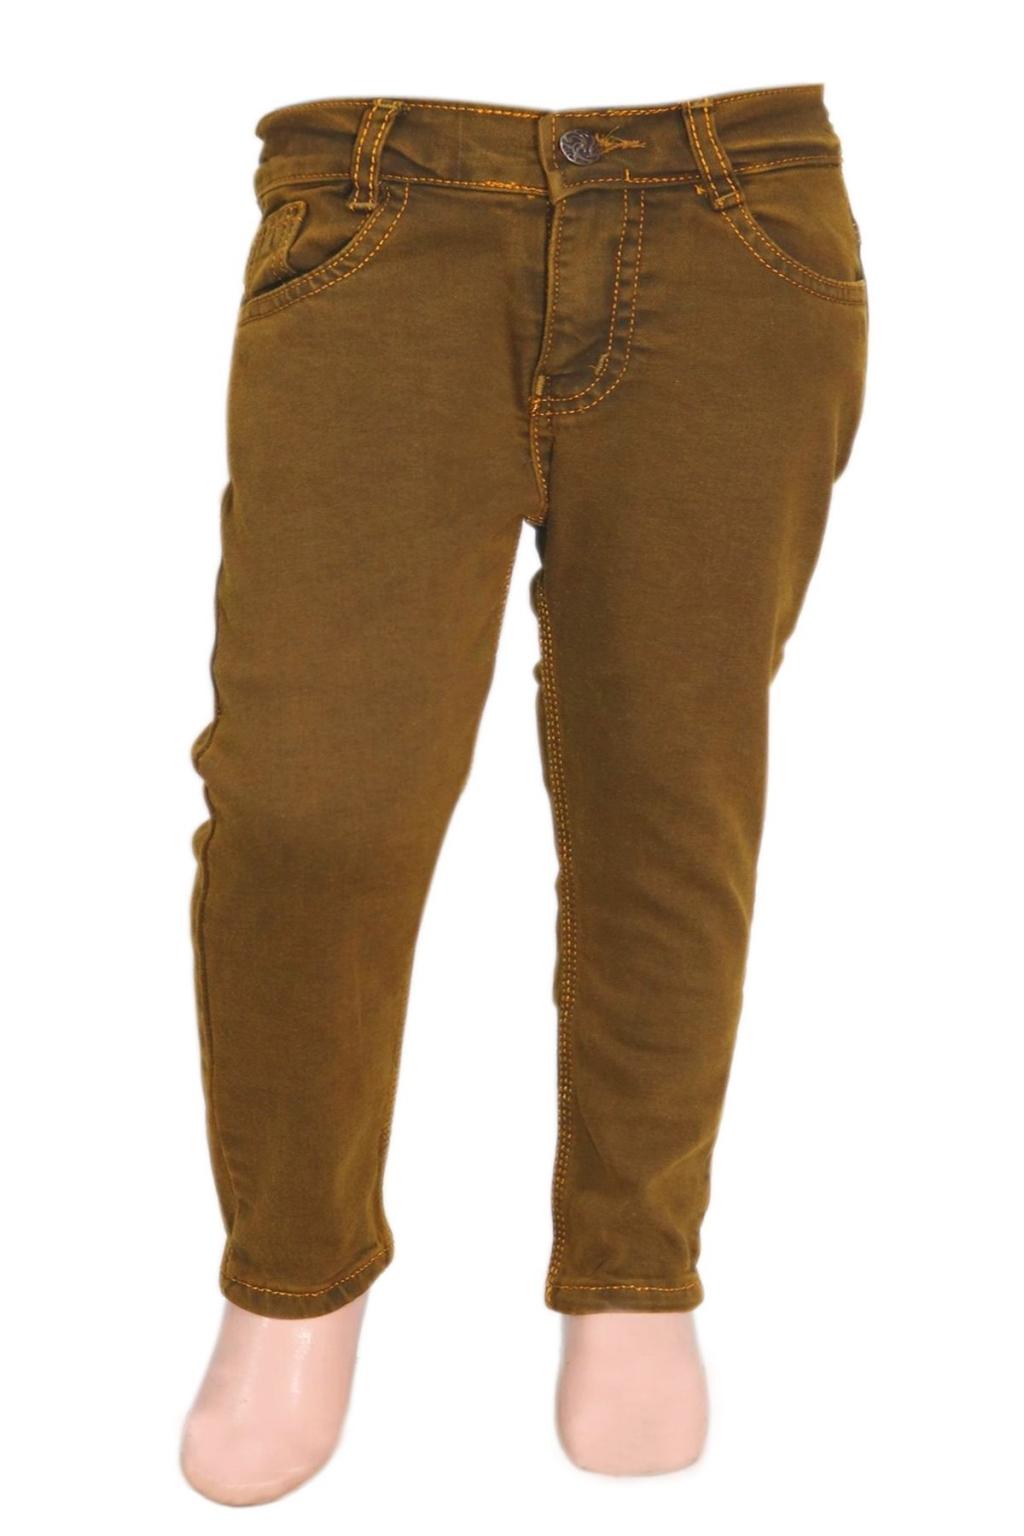 16263502460_Bindas_Collection_Camil_Color_Basic_Denim_Jeans_Pant_For_Kidsbx.jpg